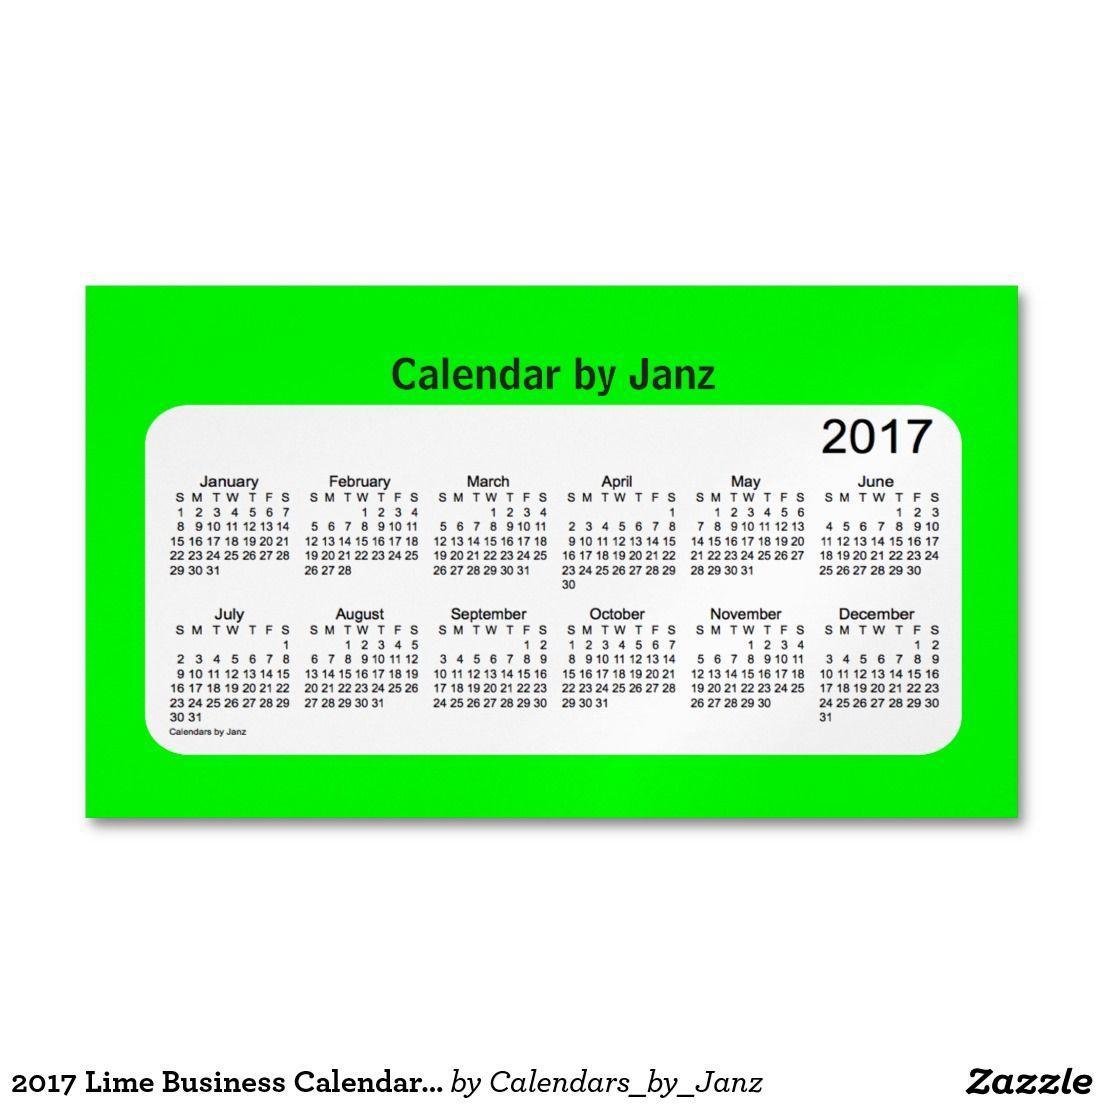 2017 lime business calendar by janz magnet business card magnet 2017 lime business calendar by janz magnet business card magnet colourmoves Images